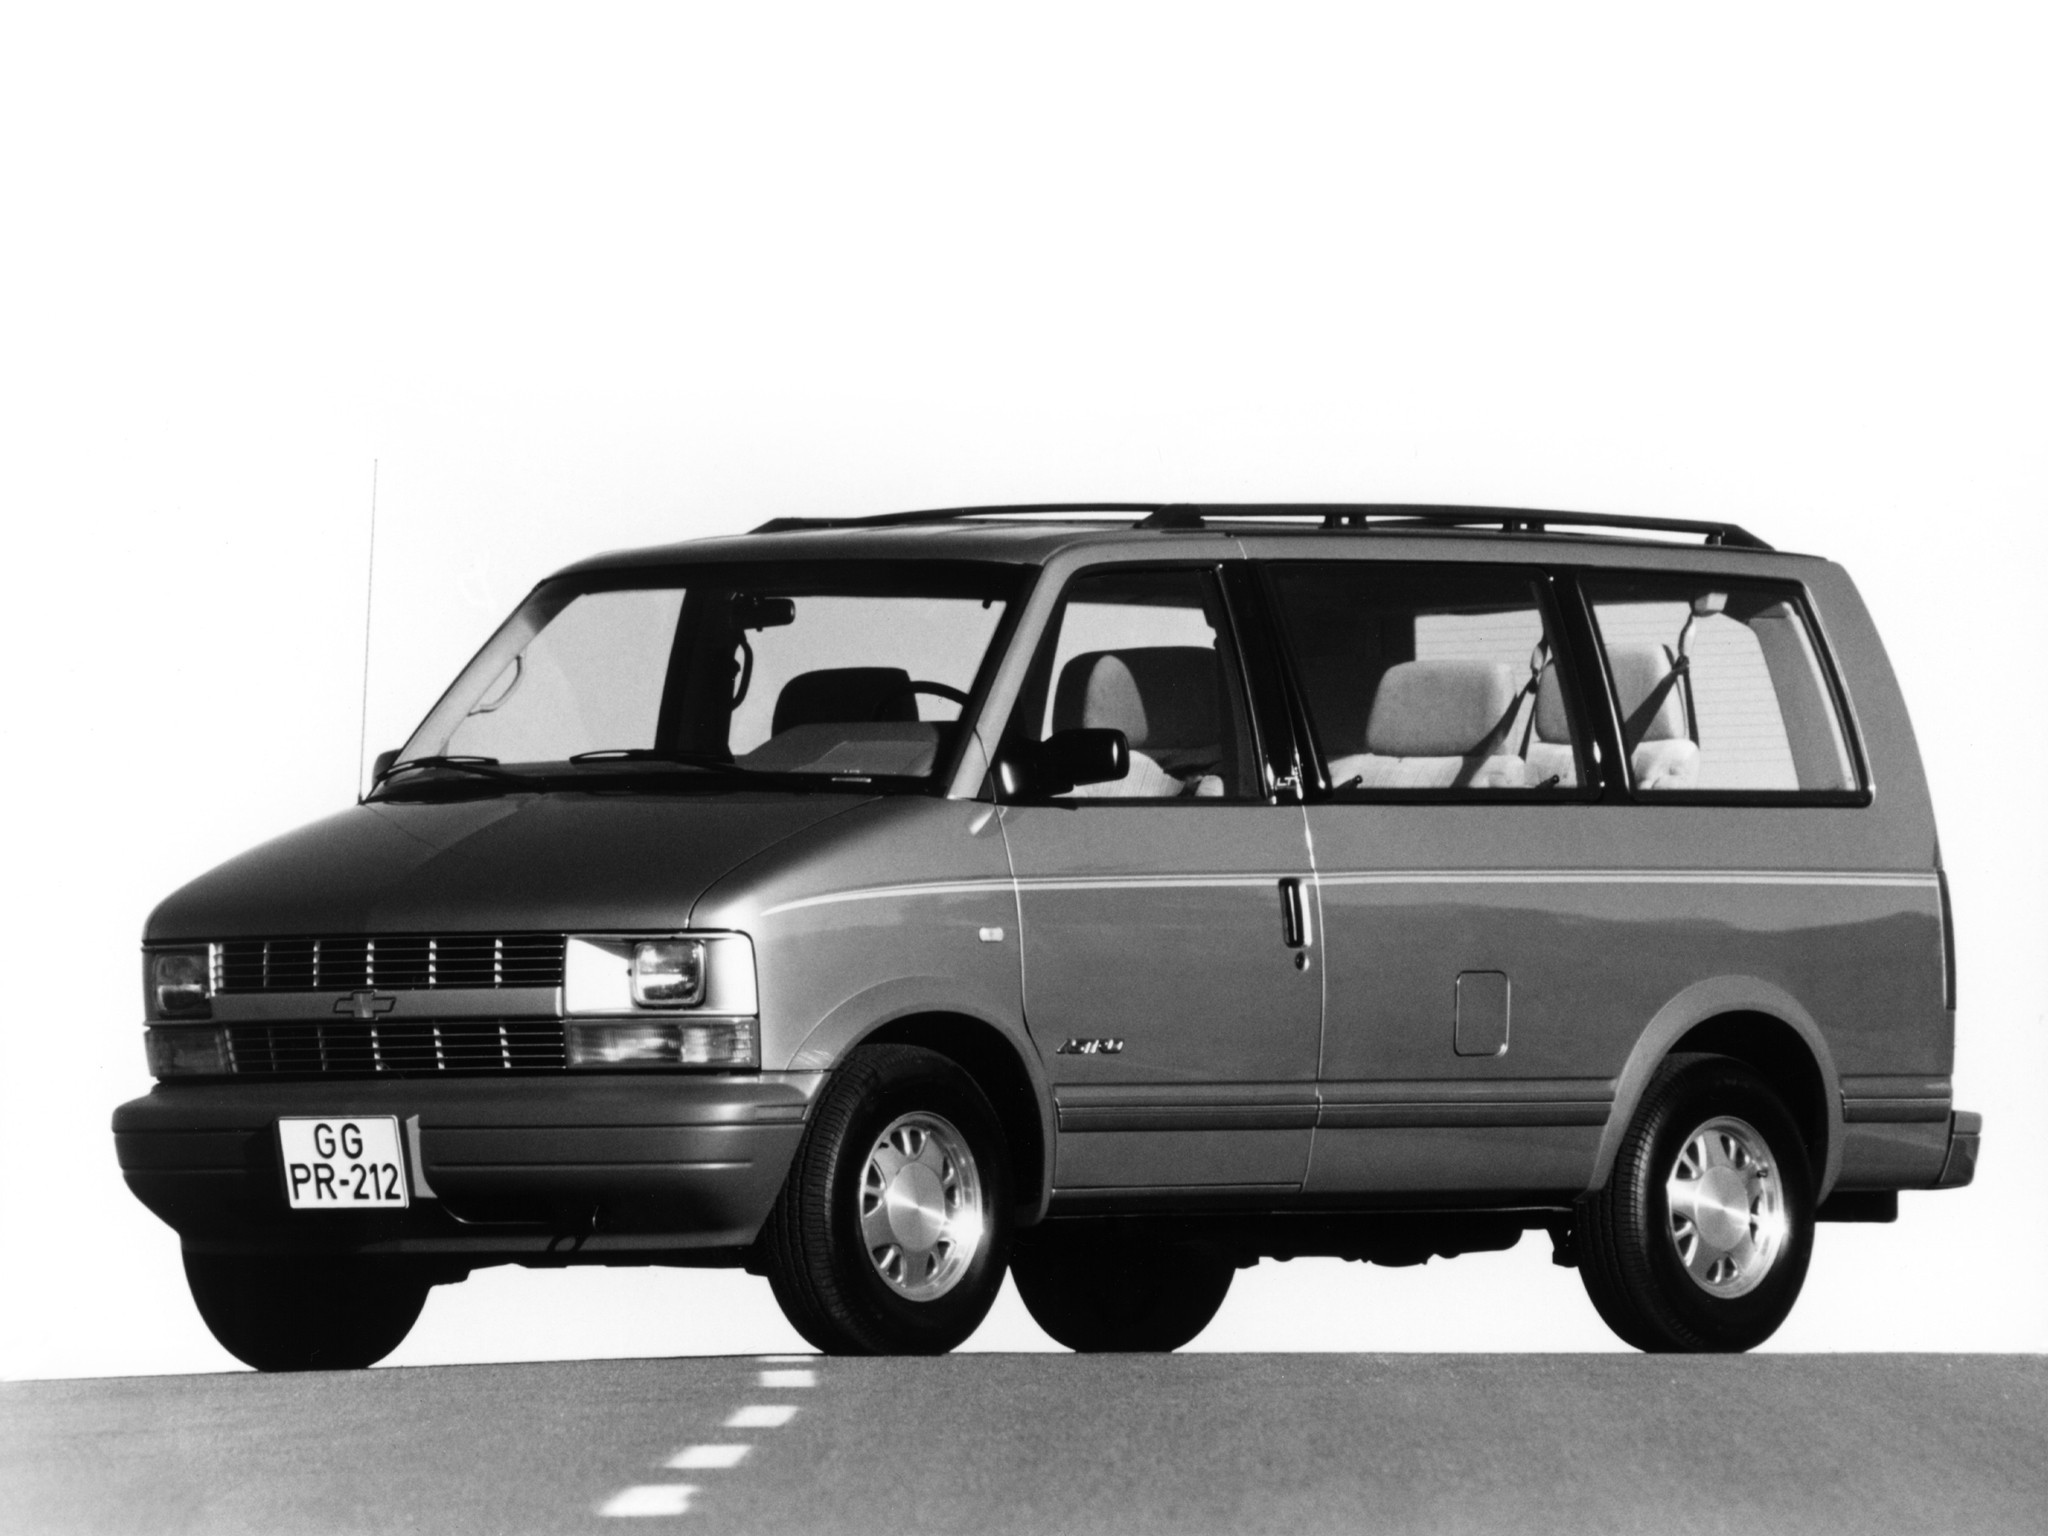 Chevrolet Astro Specs Photos 1994 1995 1996 1997 1998 1999 Opel Agila Wiring Diagram 2005